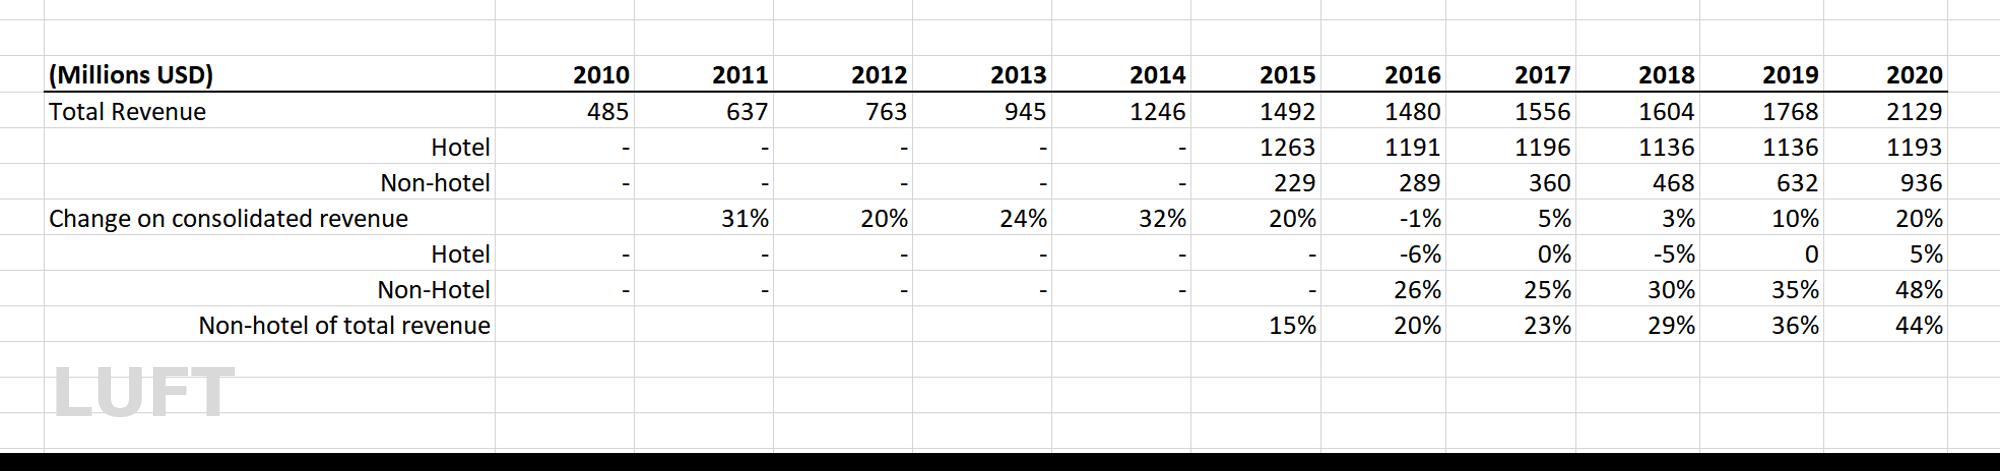 Source:   The 2020 Outlook On TripAdvisor